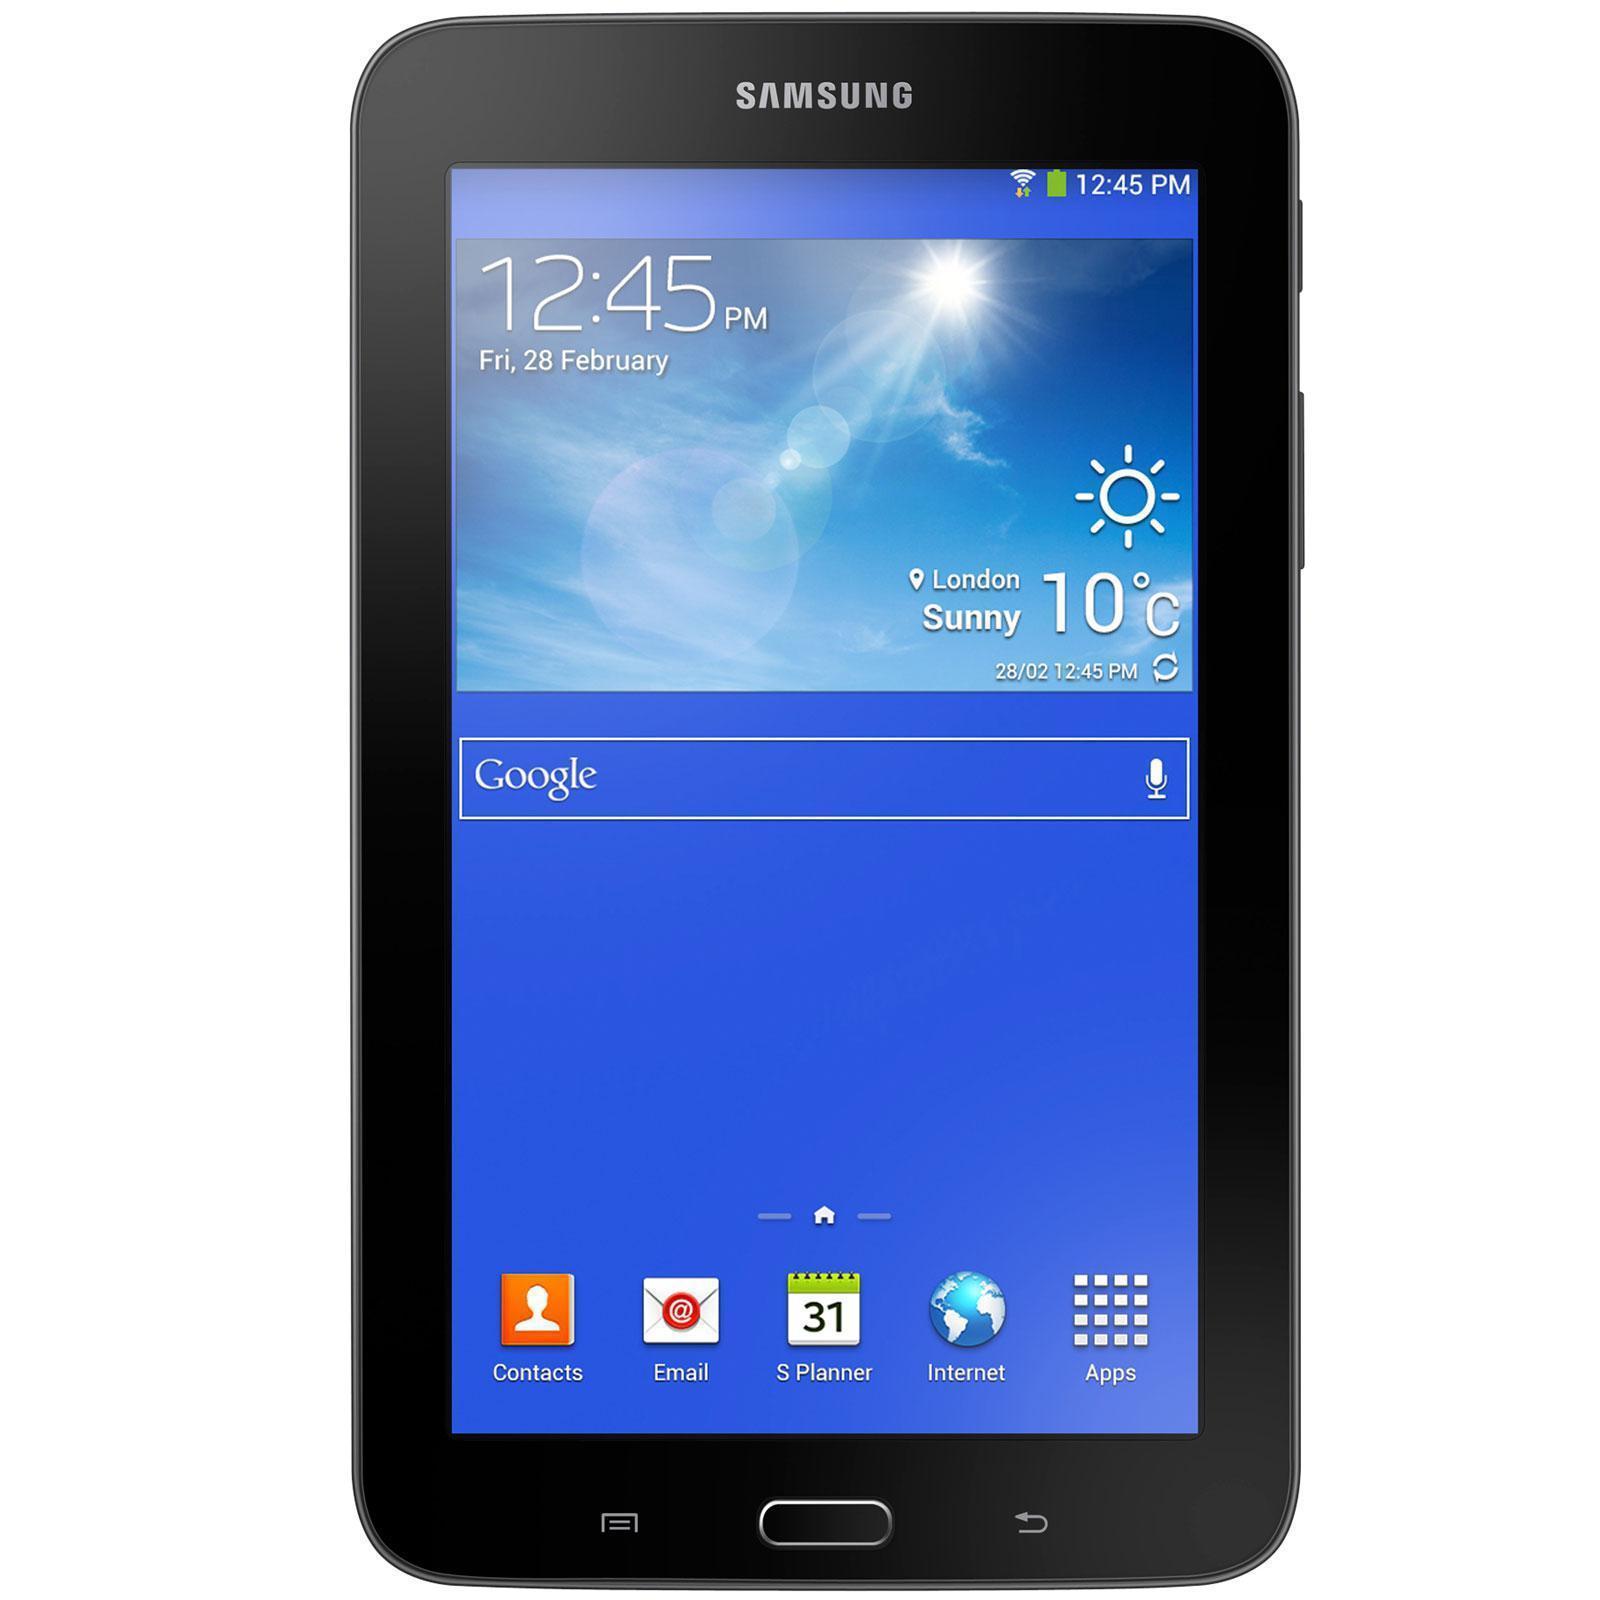 Galaxy Tab 3 Lite (2013) - WiFi